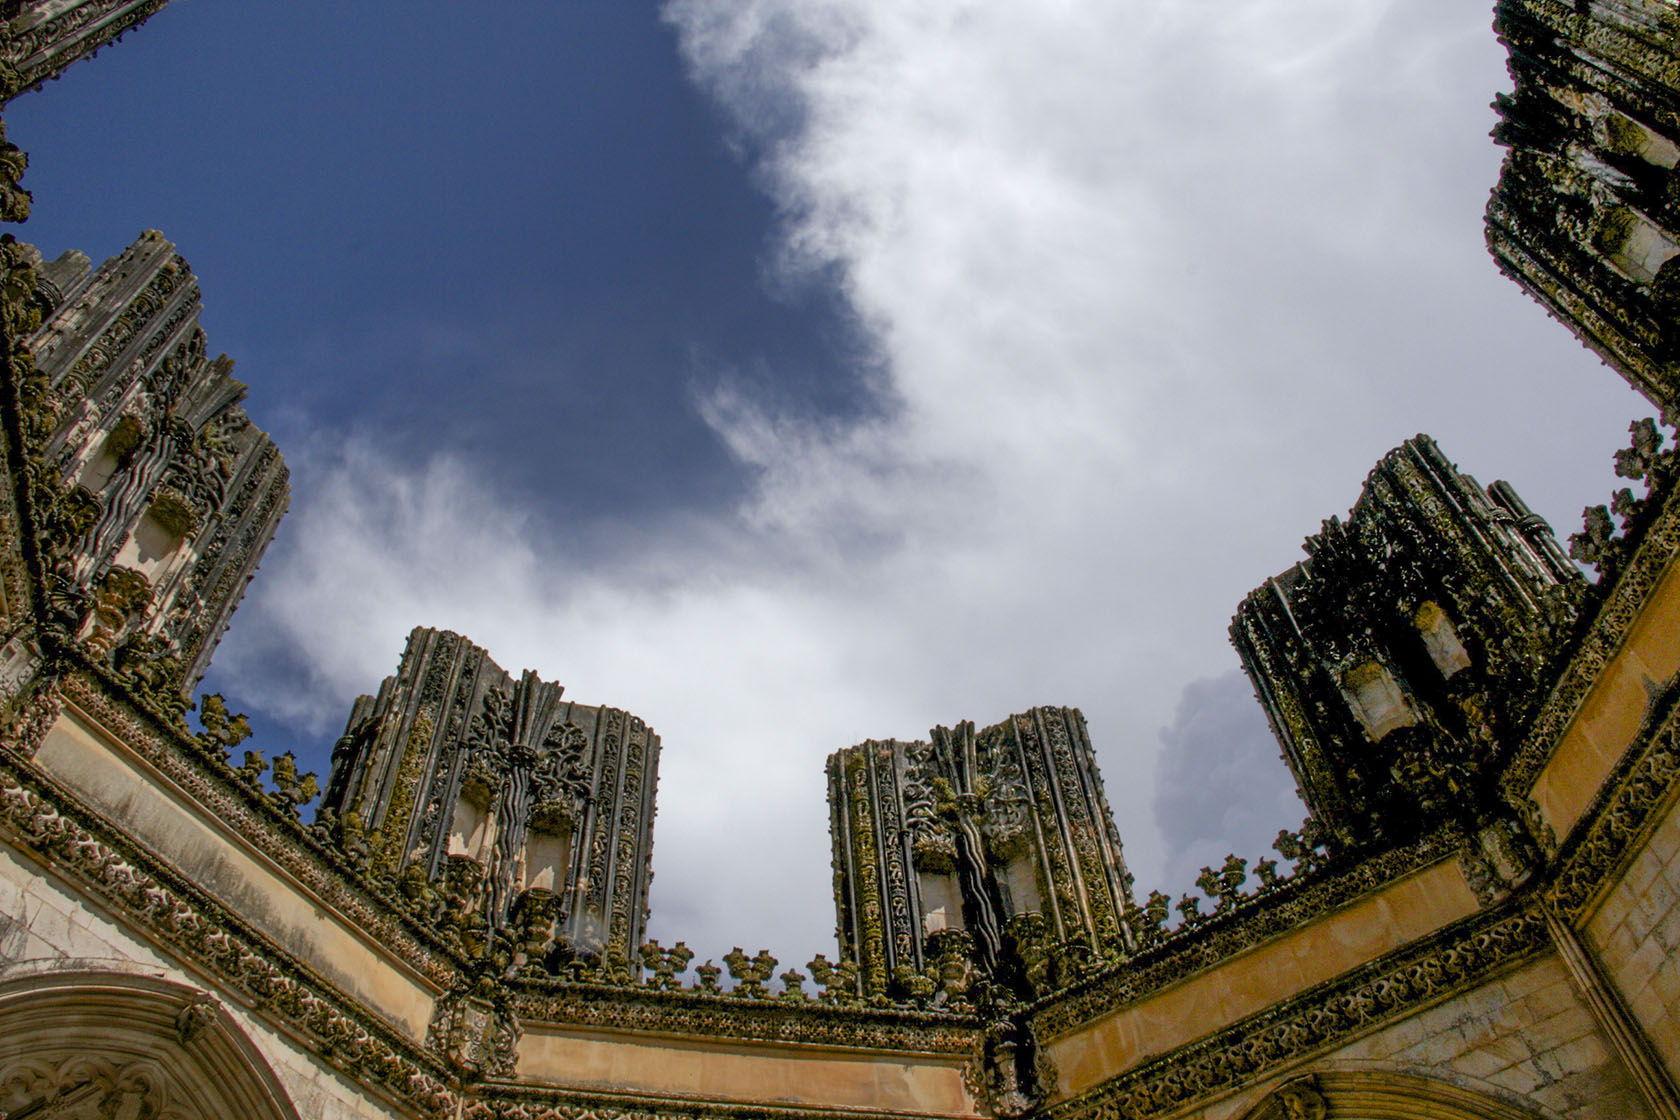 Monastre de #Batalha Unfinished Chapel #Portugal #Manueline @GingerandNutmeg